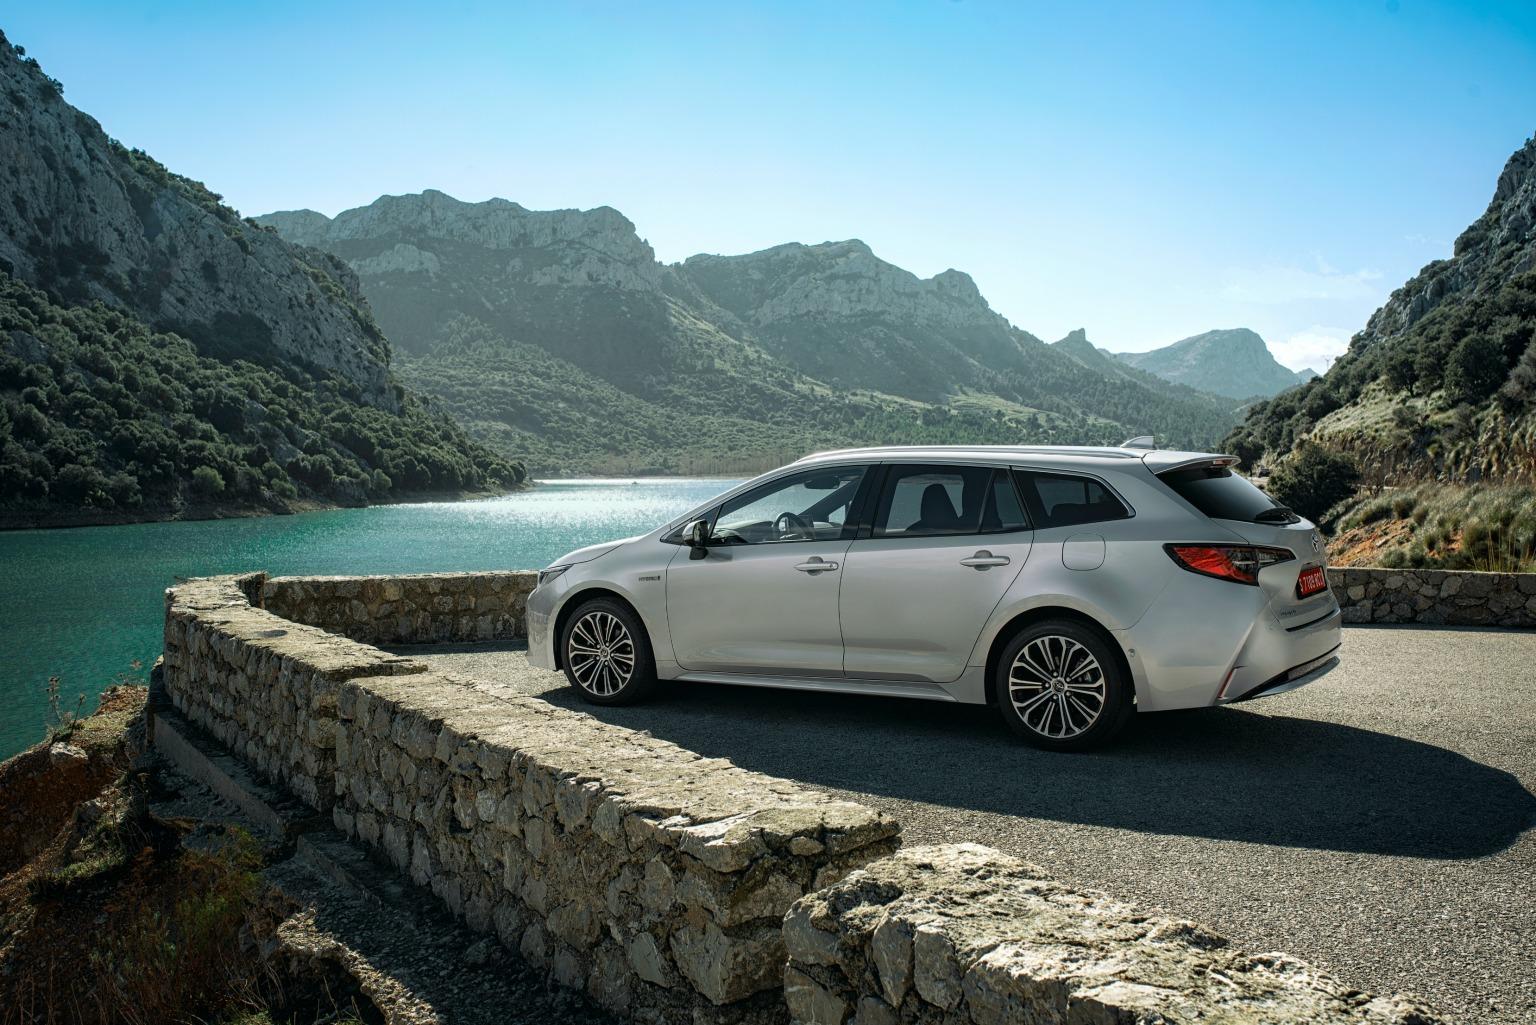 Esterni nuova Toyota Corolla Touring Sports